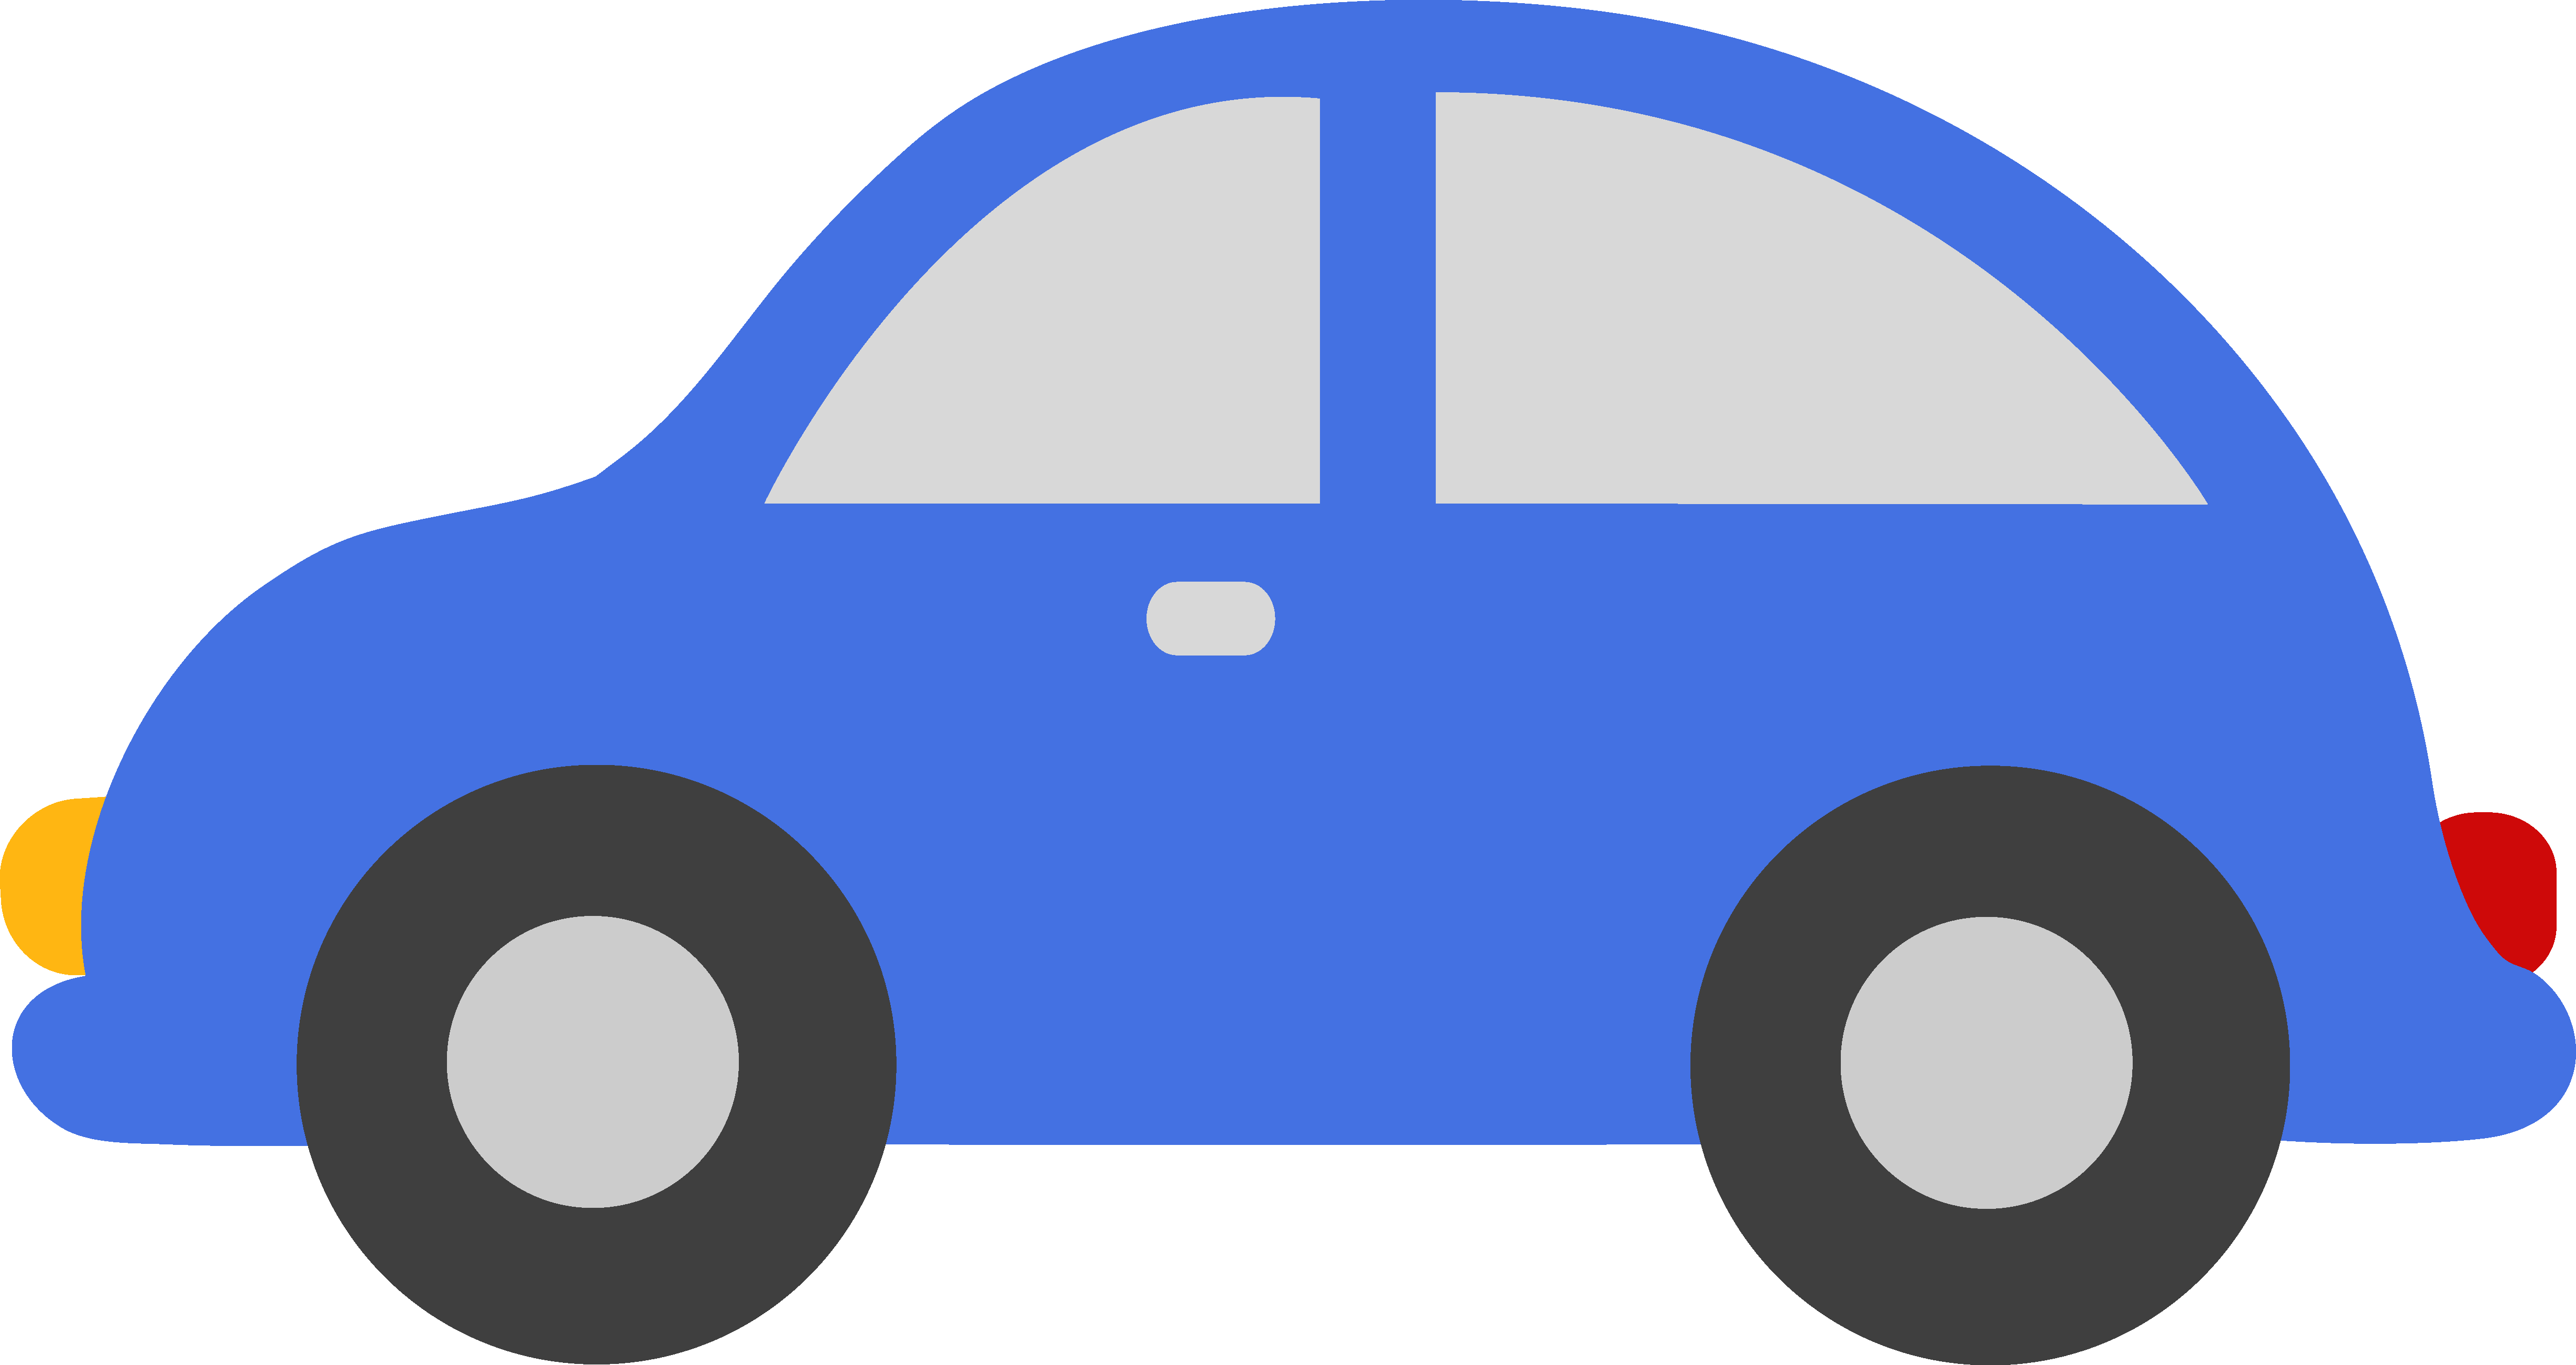 Red Car Illustration Car Transport Cartoon Car Transparent Background Png Clipart Car Cartoon Cartoon Car Drawing Car Illustration